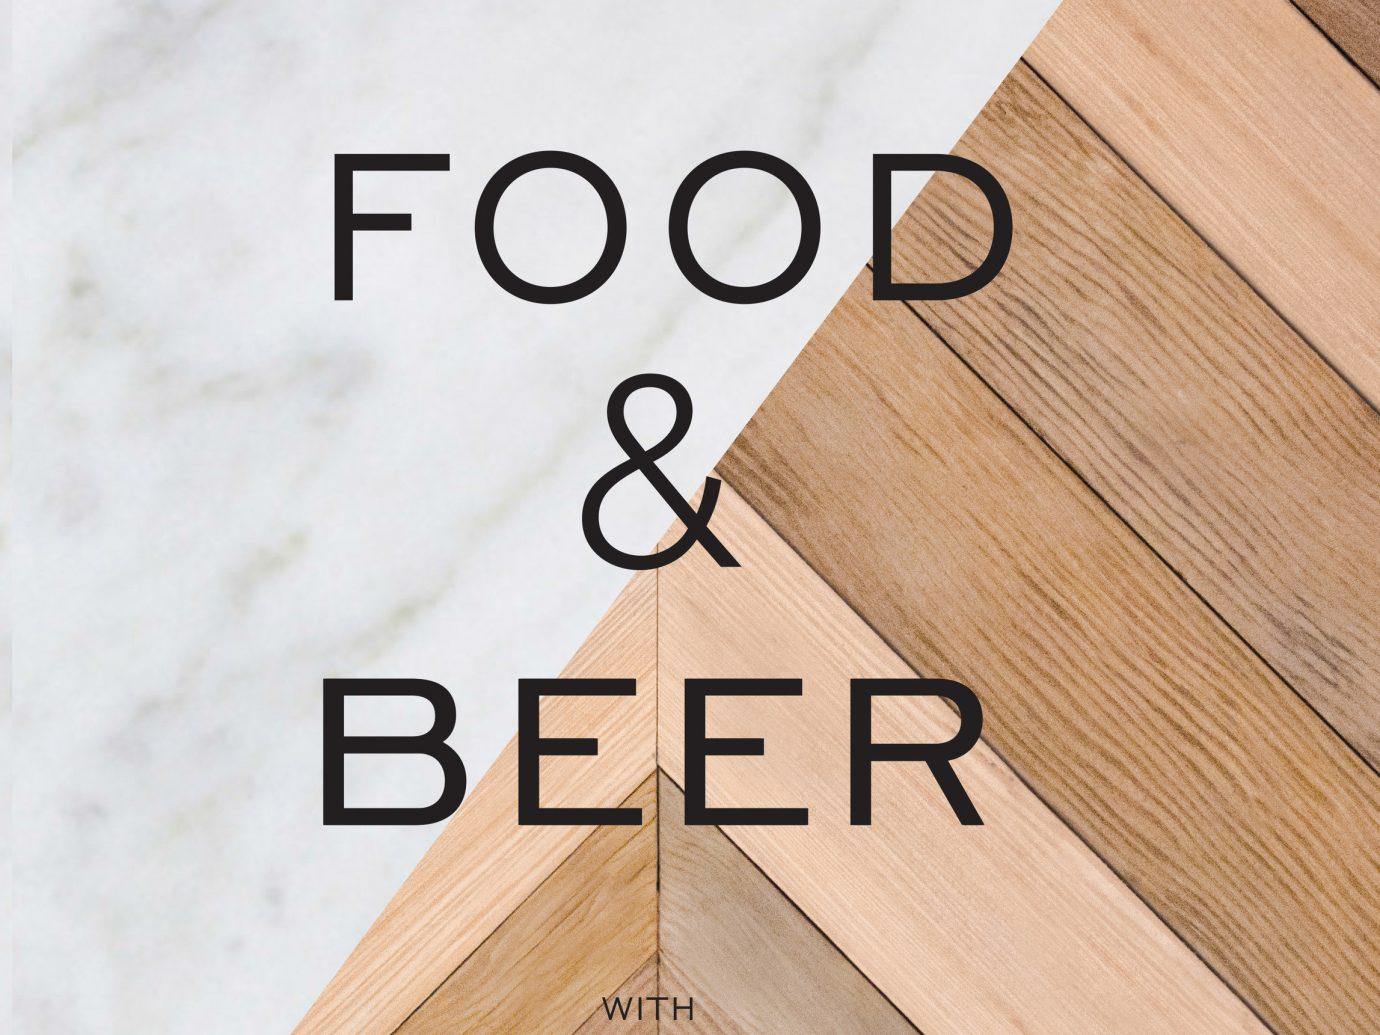 Food + Drink wood floor hardwood font brand wood stain flooring wood flooring line